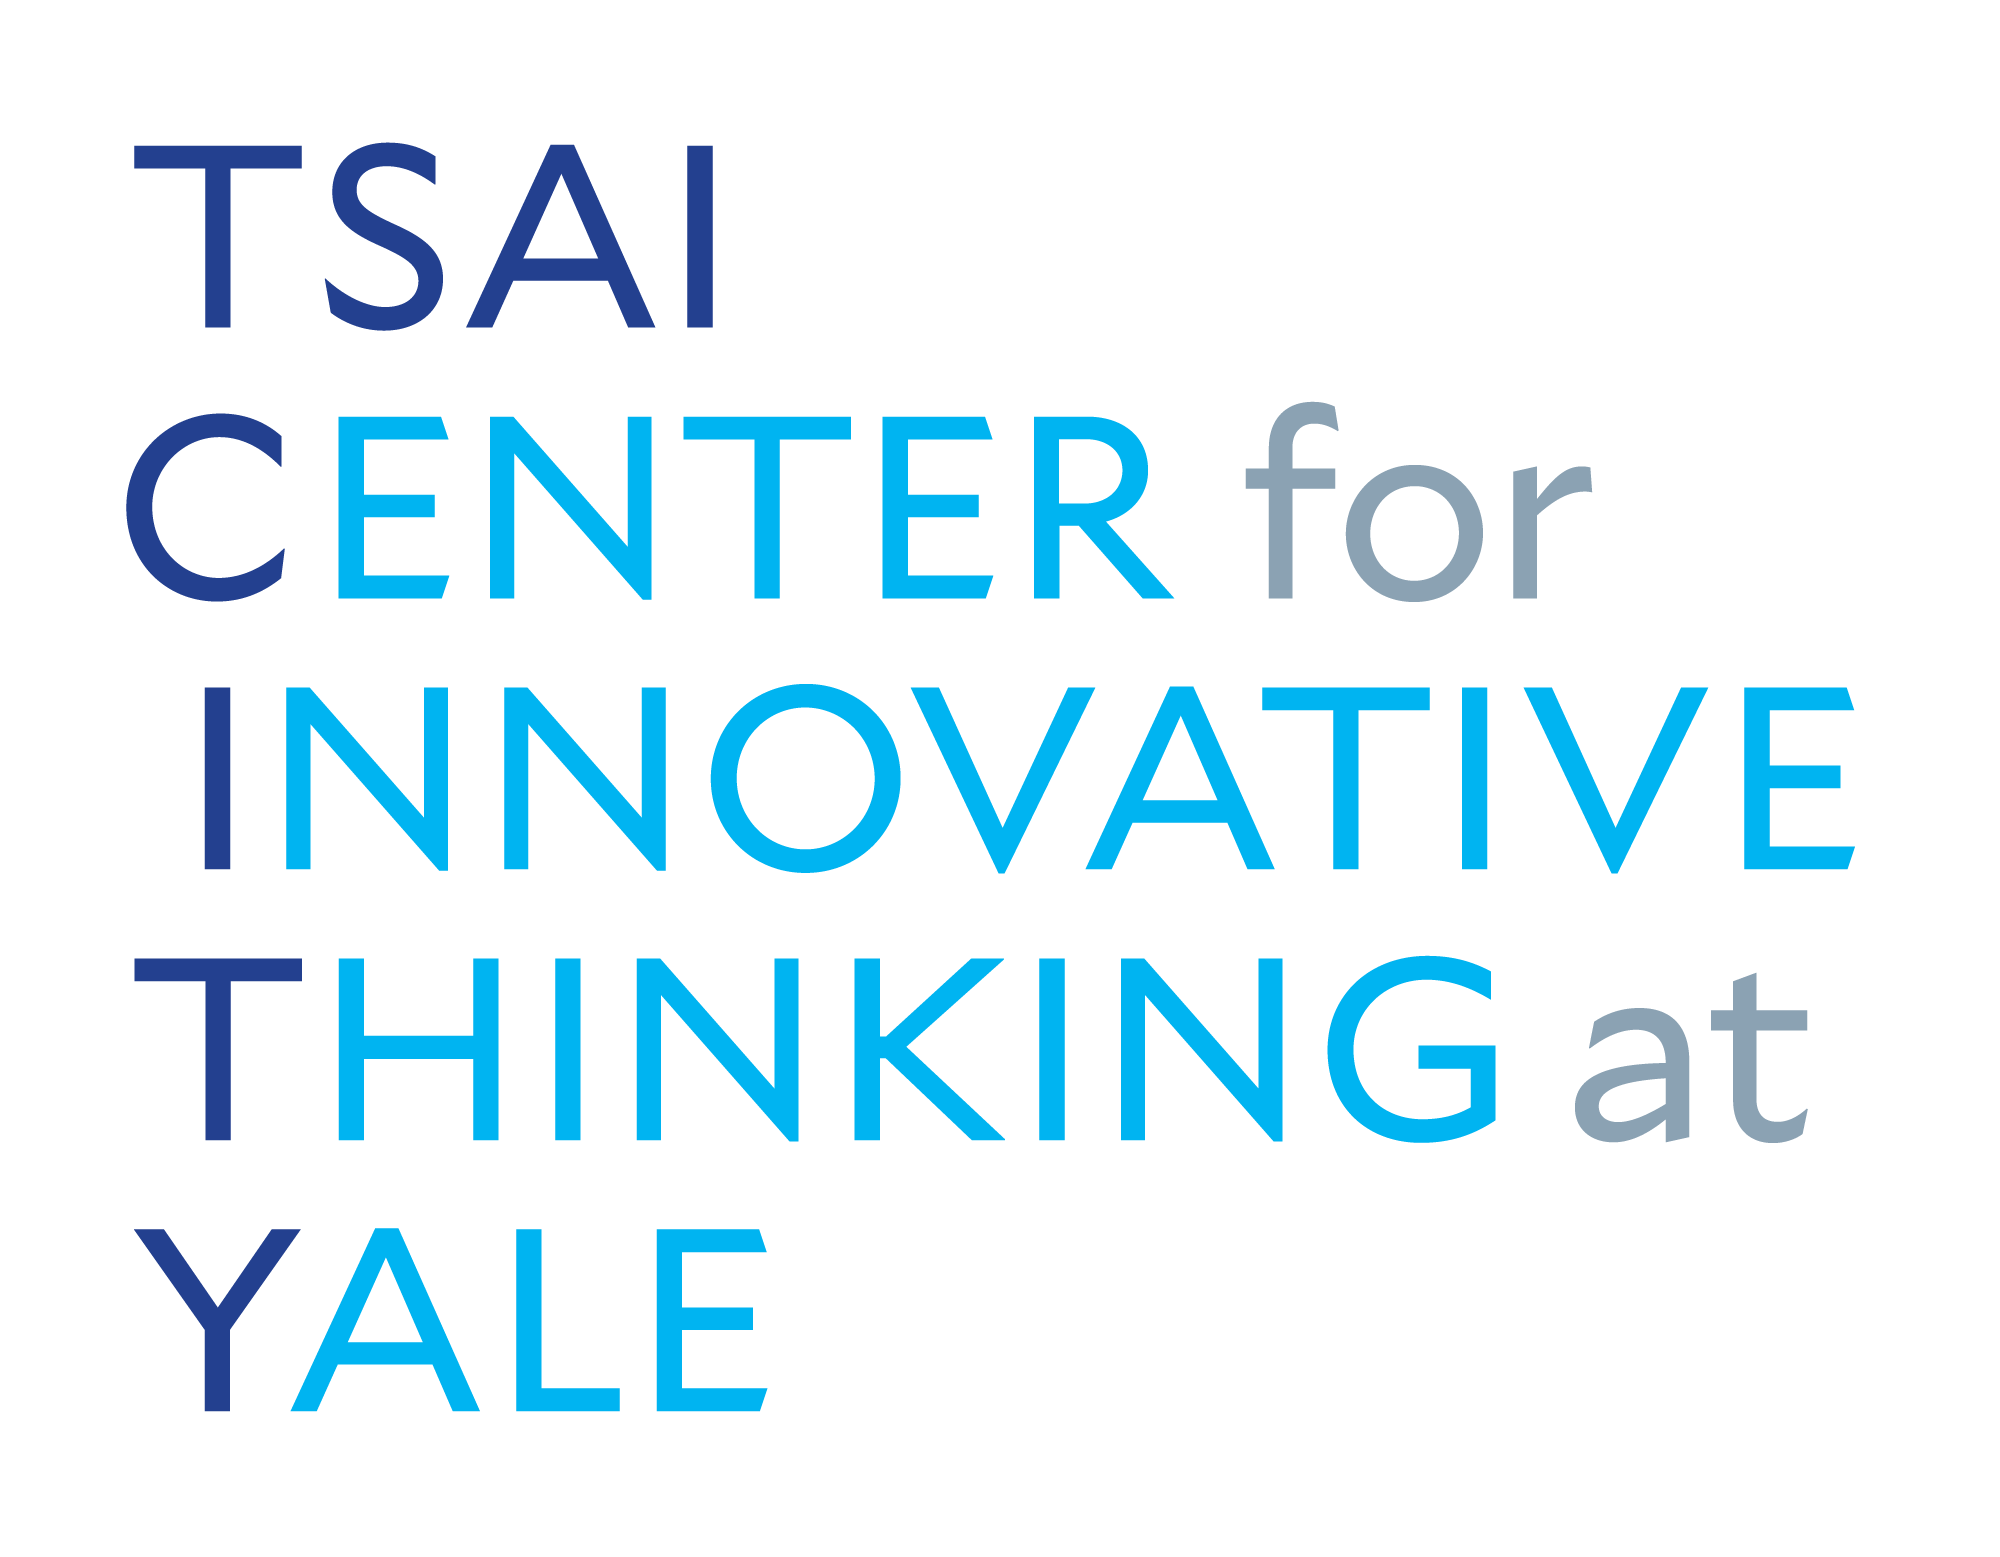 Tsai Center for Innovative Thinking at Yale (Tsai CITY)